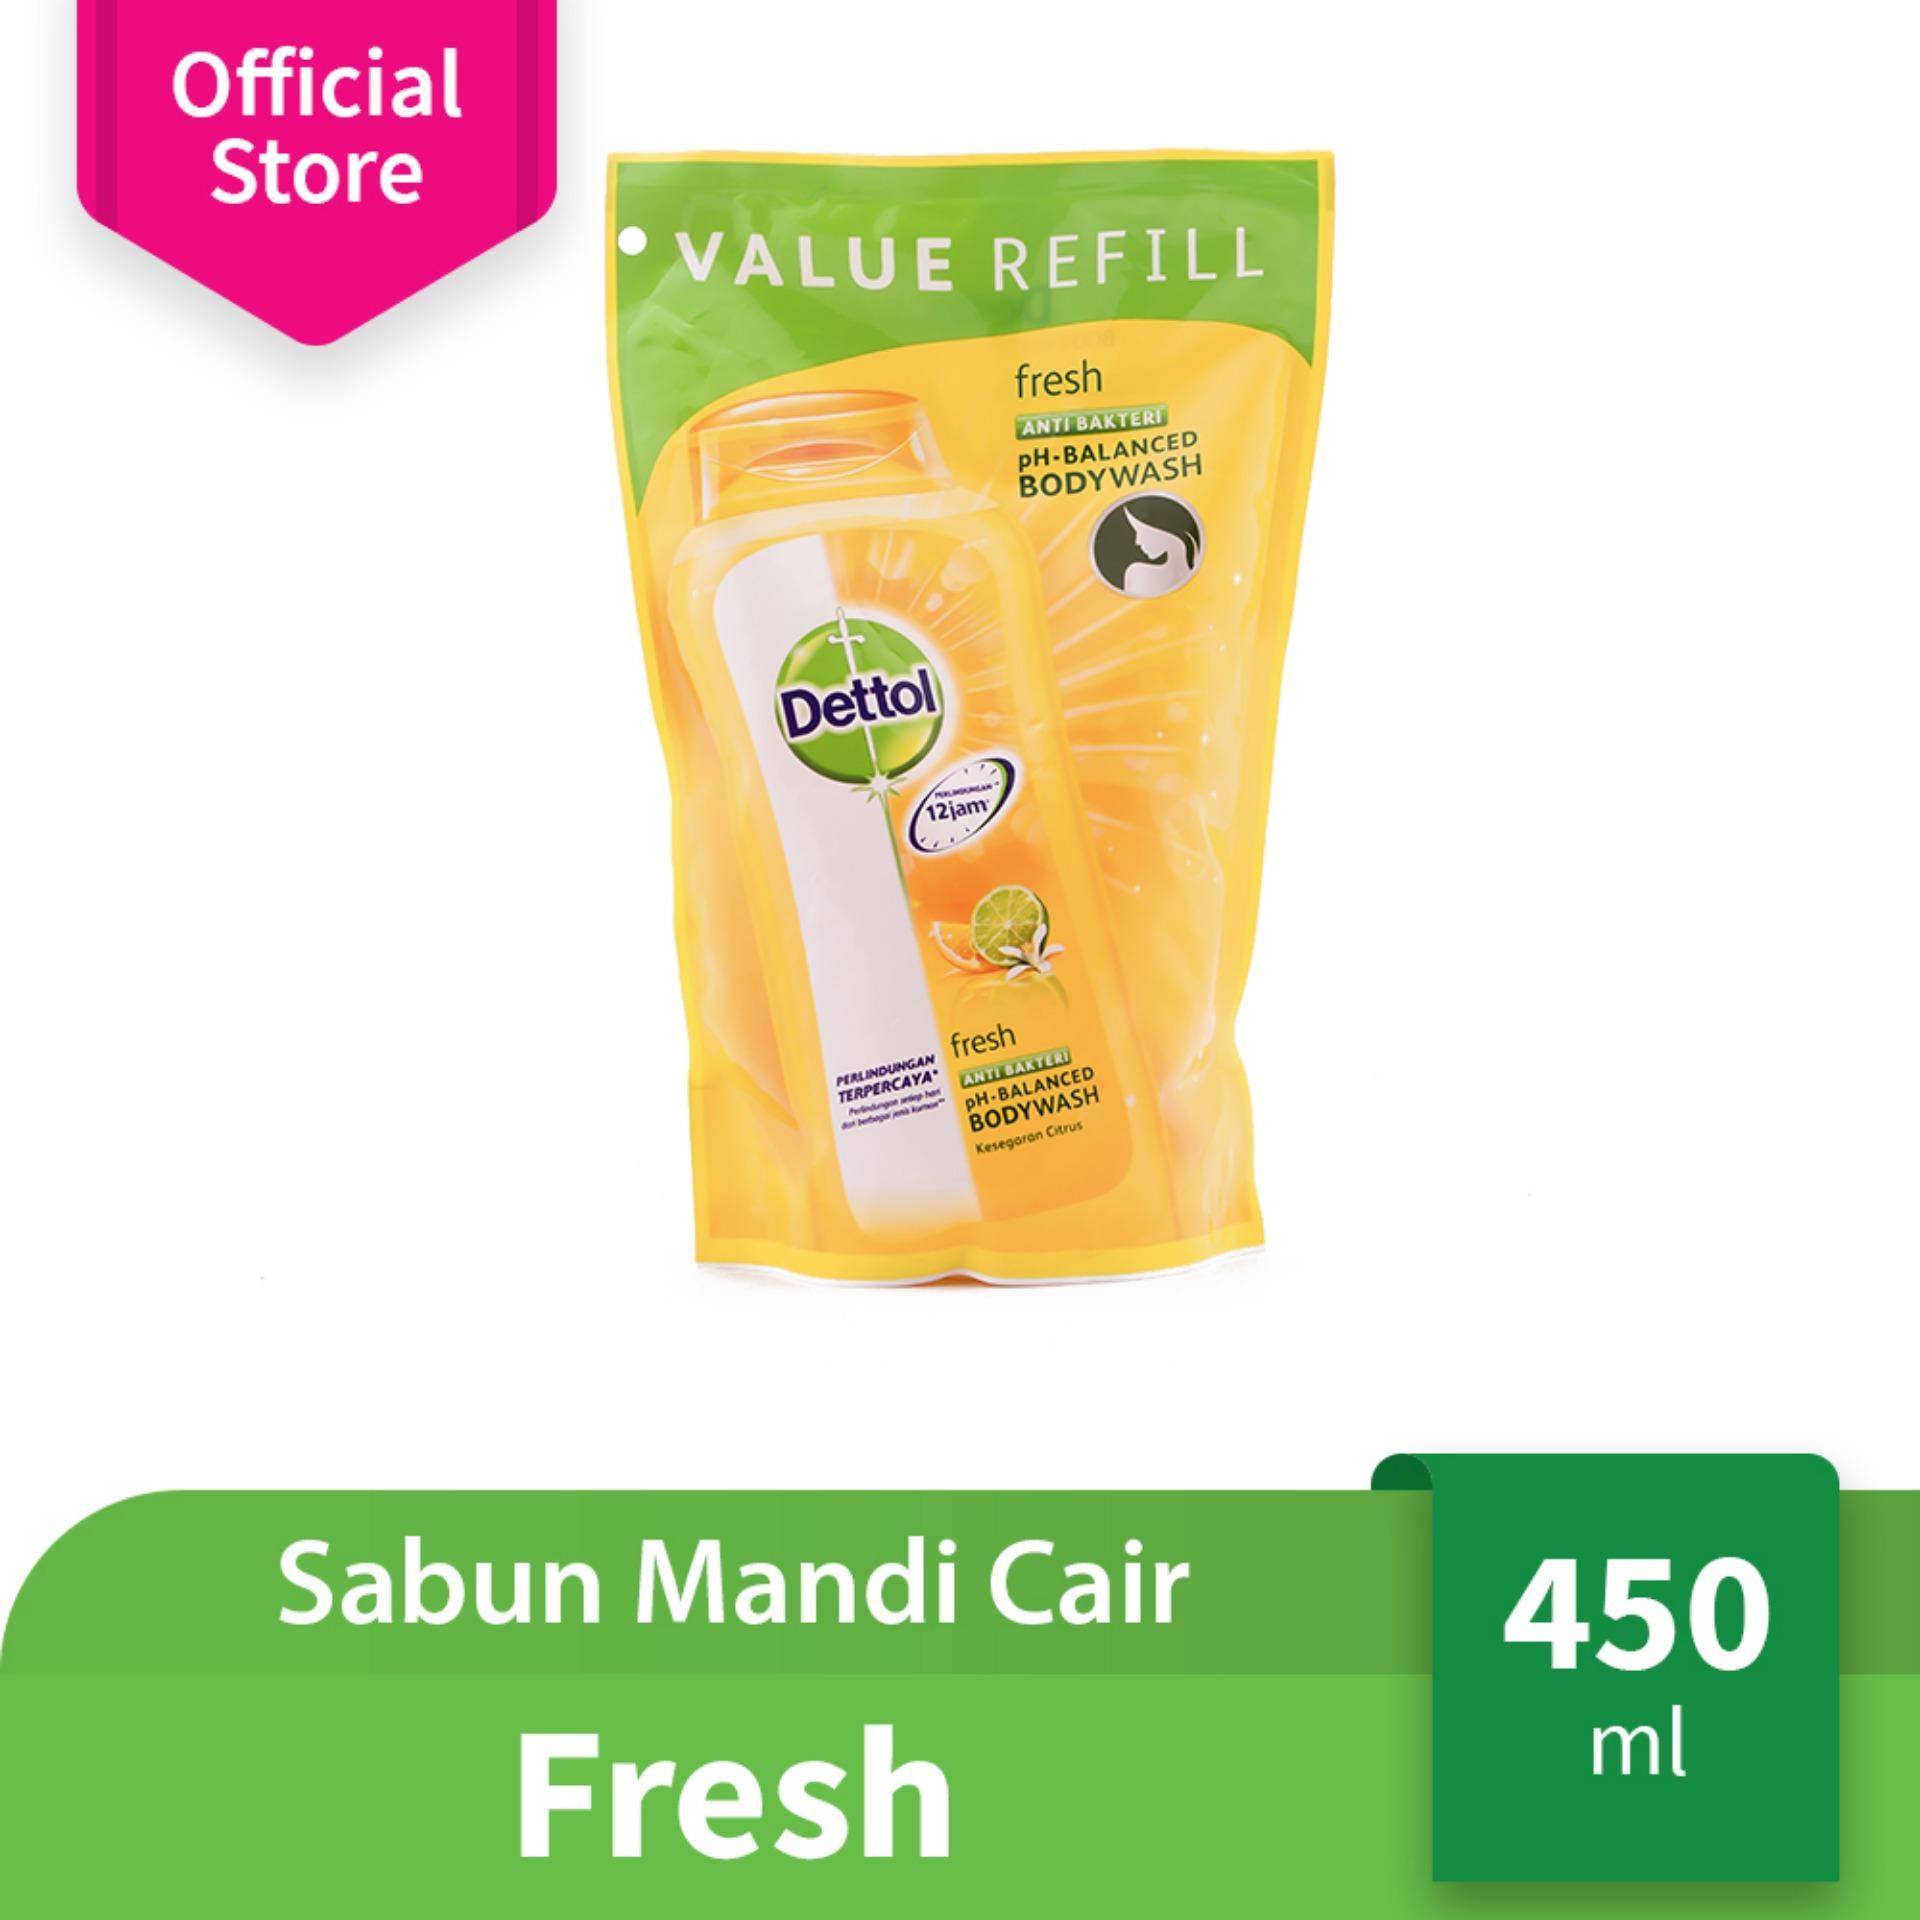 Dettol Sabun Mandi Cair Fresh - Pouch - 450ml - Body Wash Anti Kuman